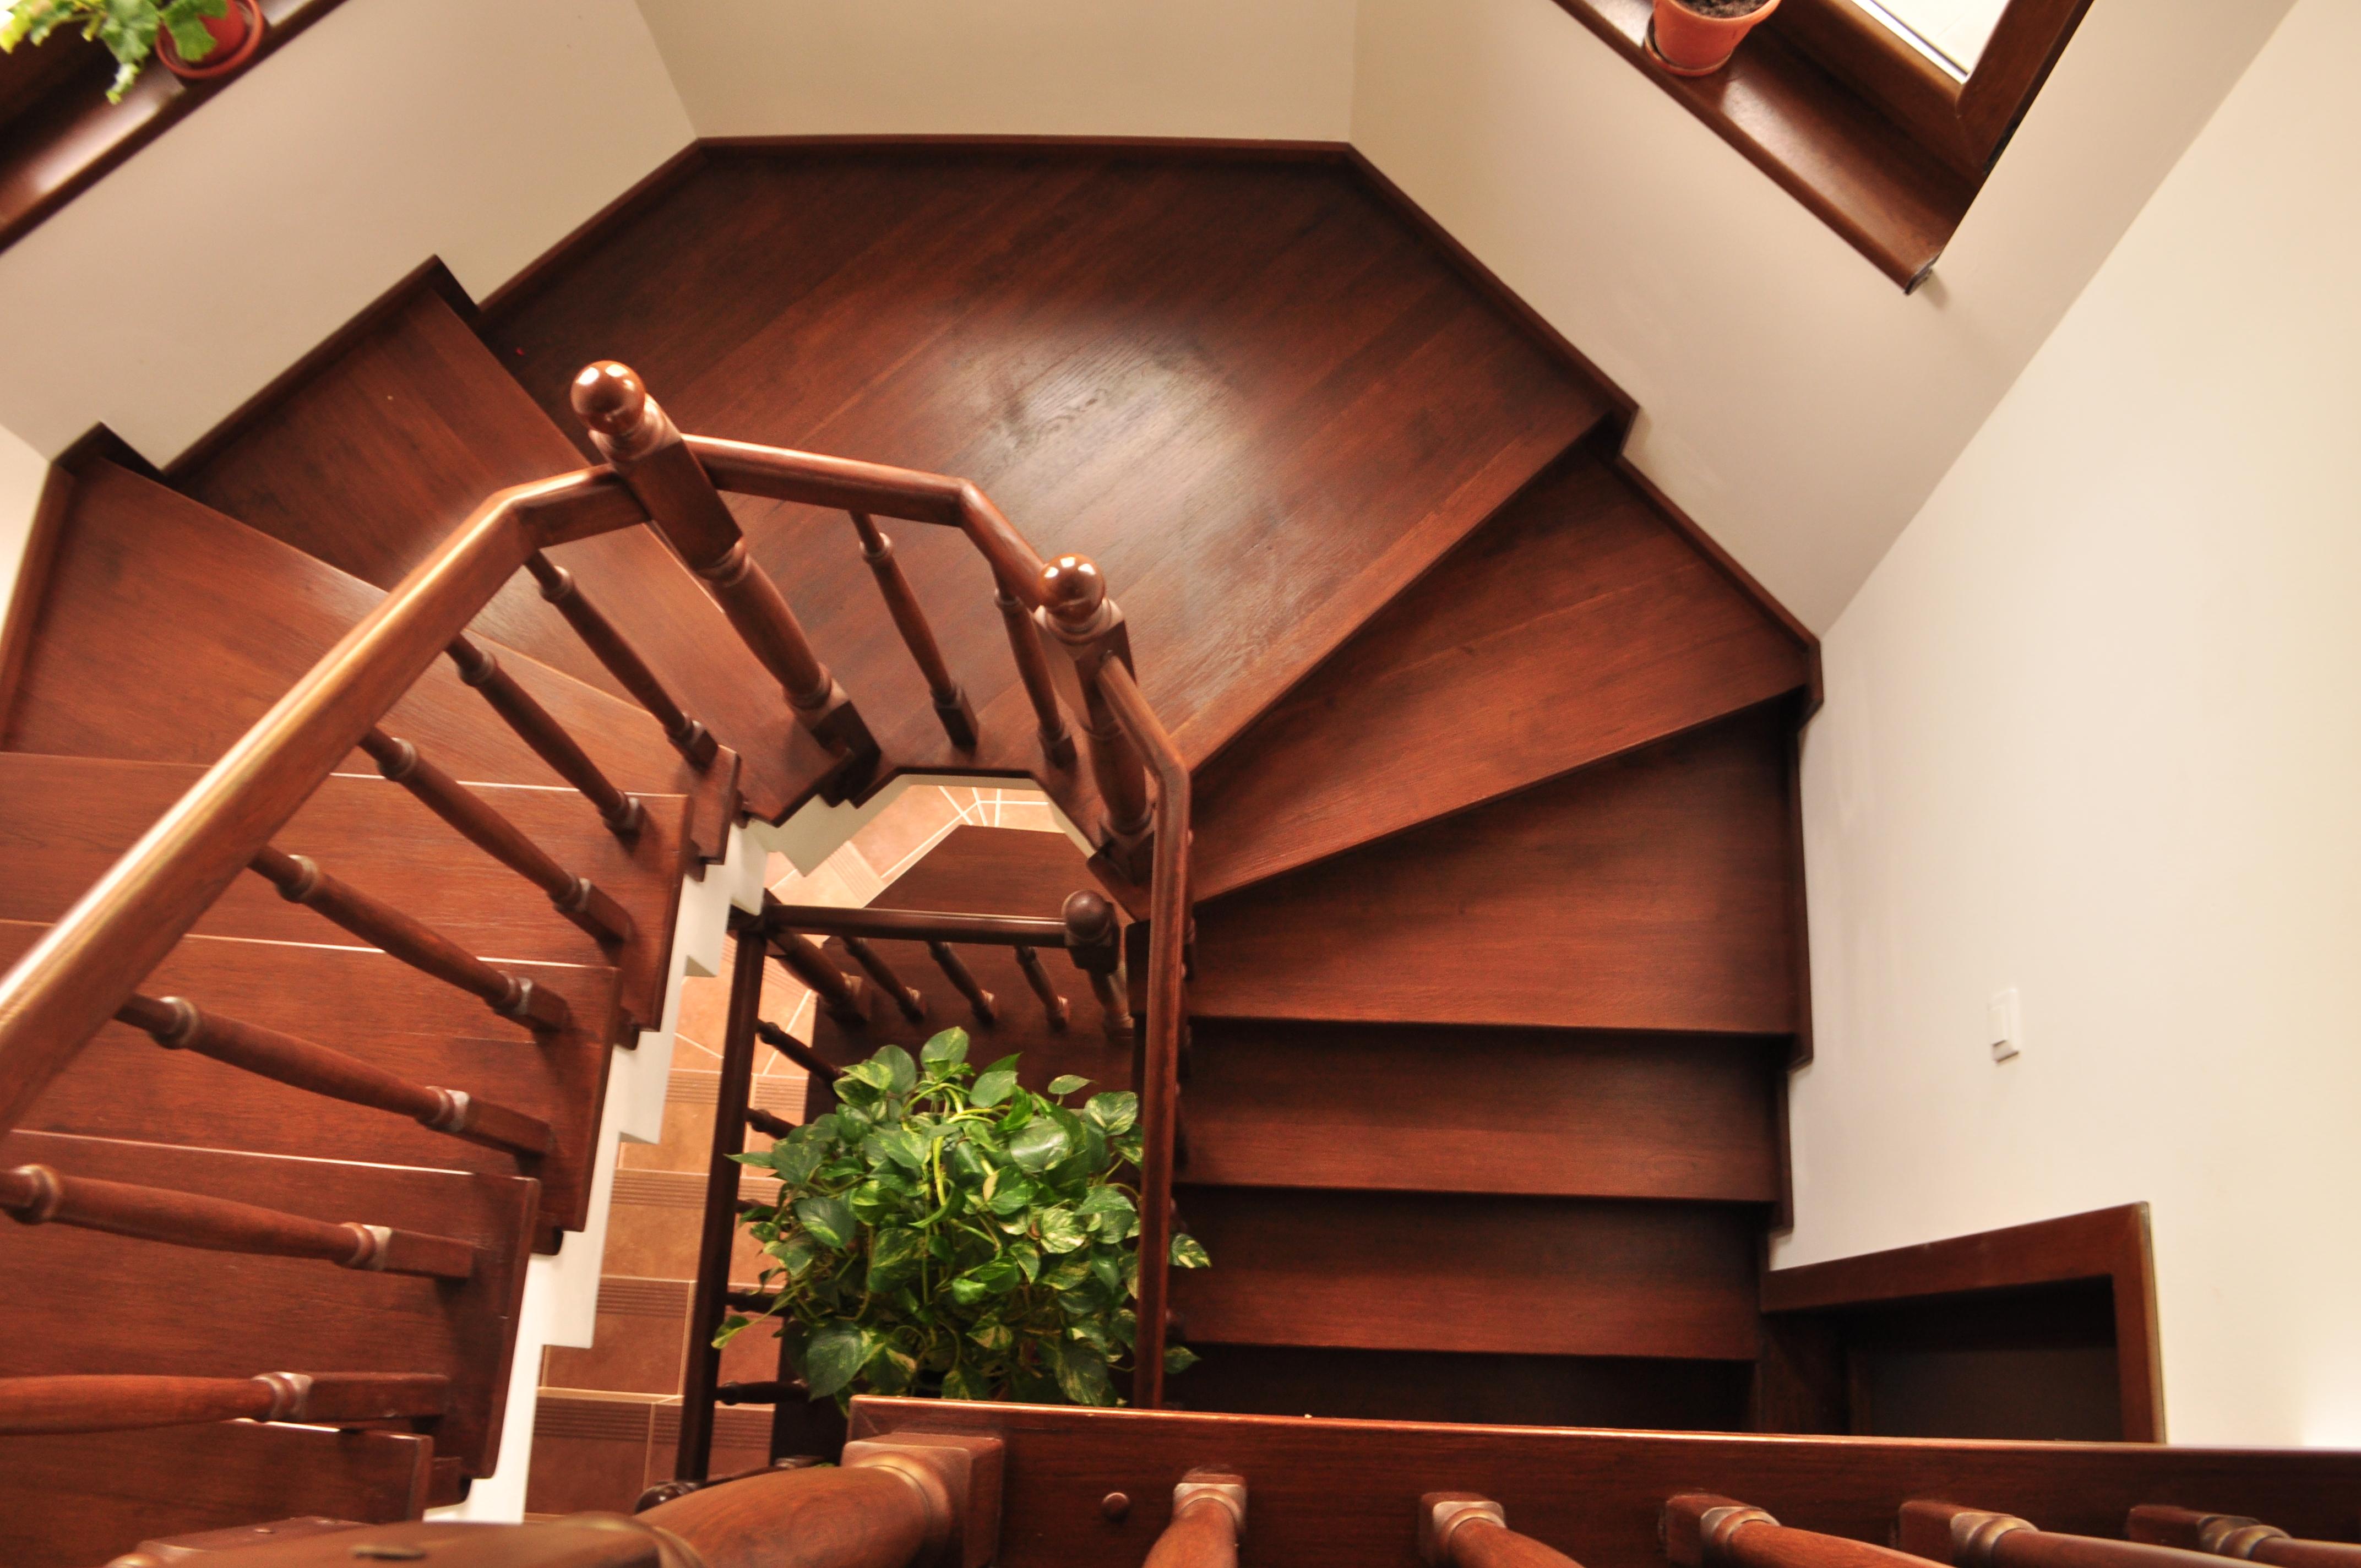 Trepte si Balustrada din lemn - Scara din beton balansata 1 TURSO HOLZ - Poza 9